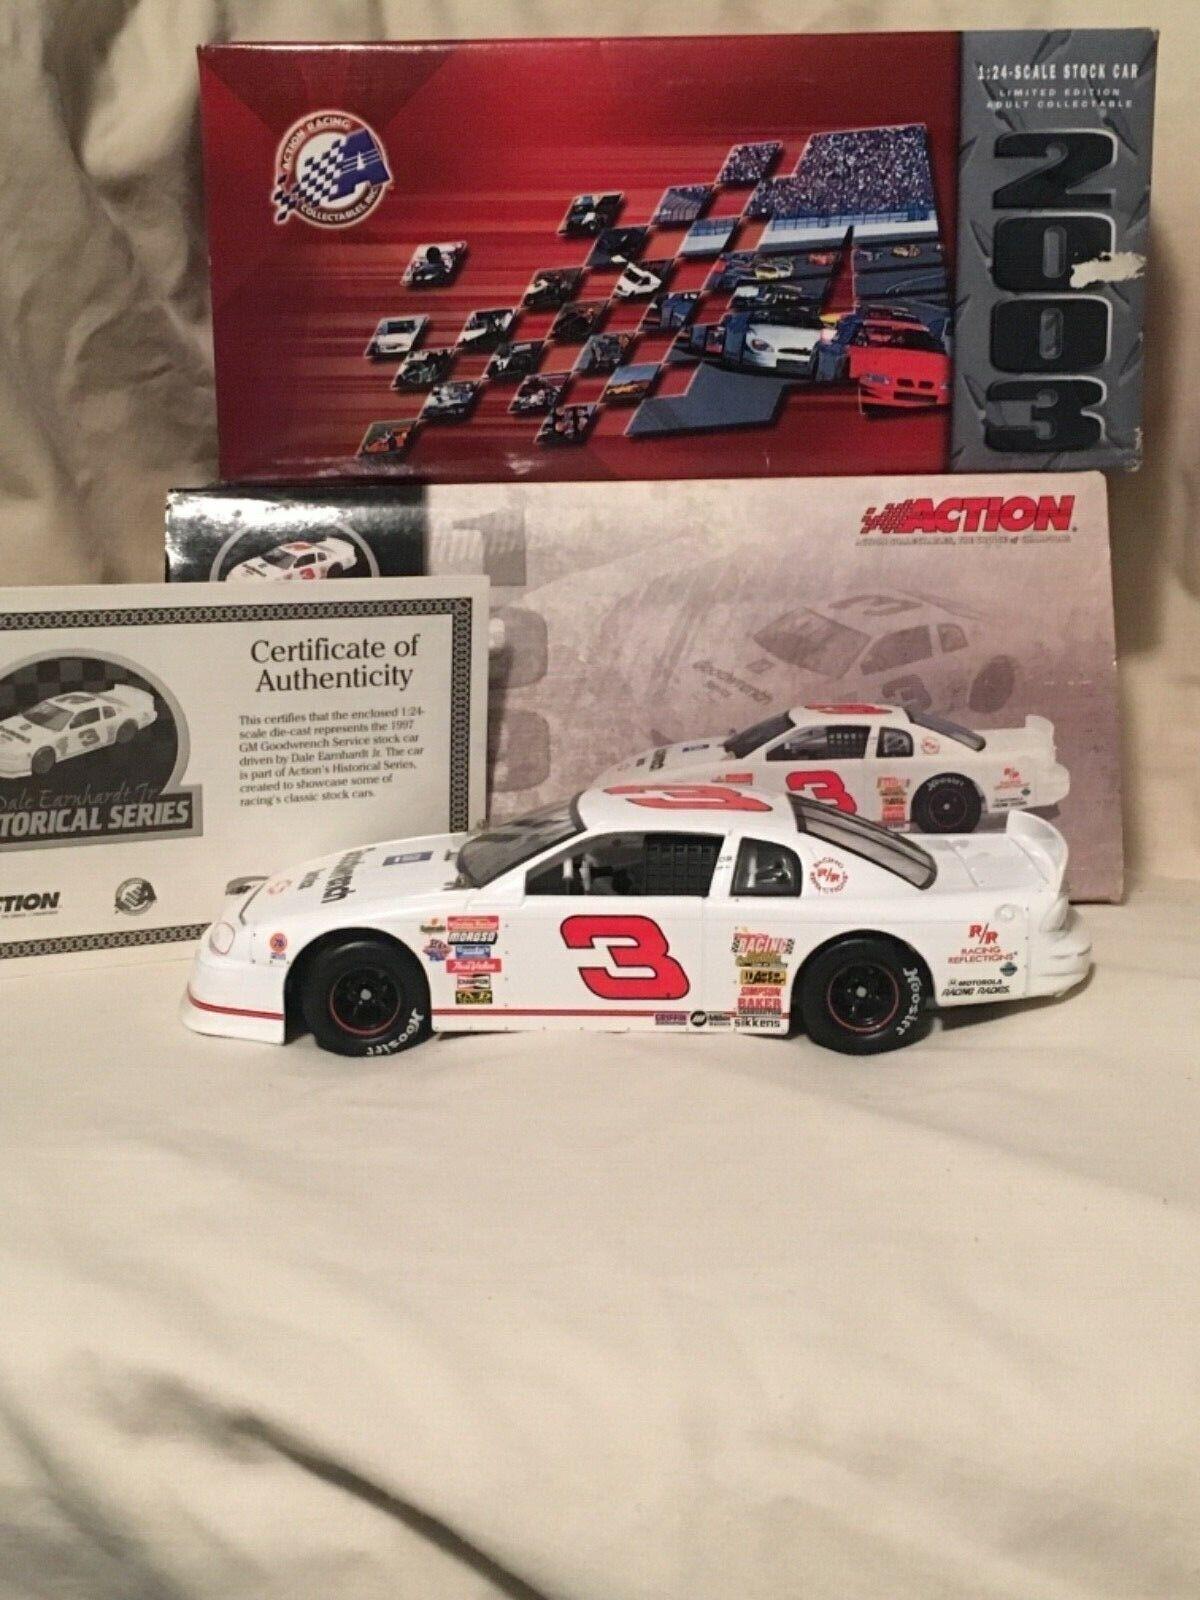 2003 NASCAR GM1997 Monte Carlo Dale Earnhardt Jr. 1 24 Historical Action Busch